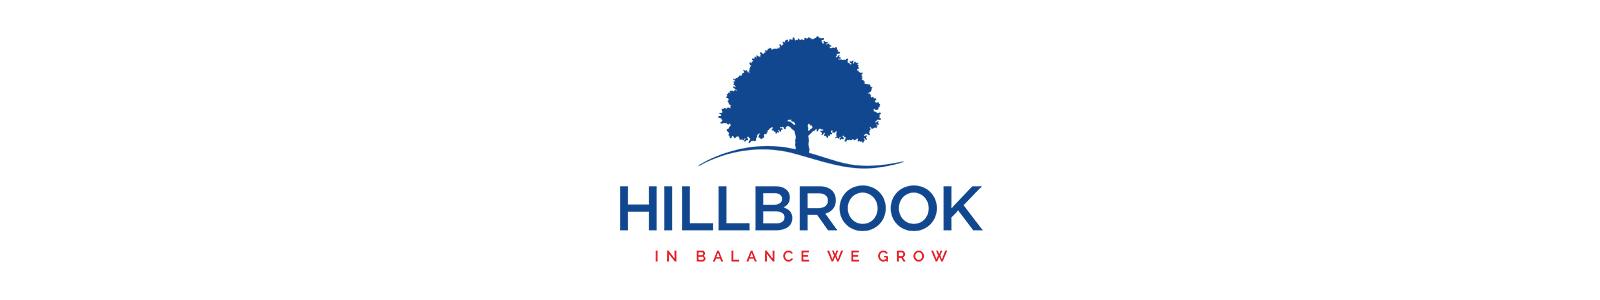 Hillbrook Anglican School - Case Study